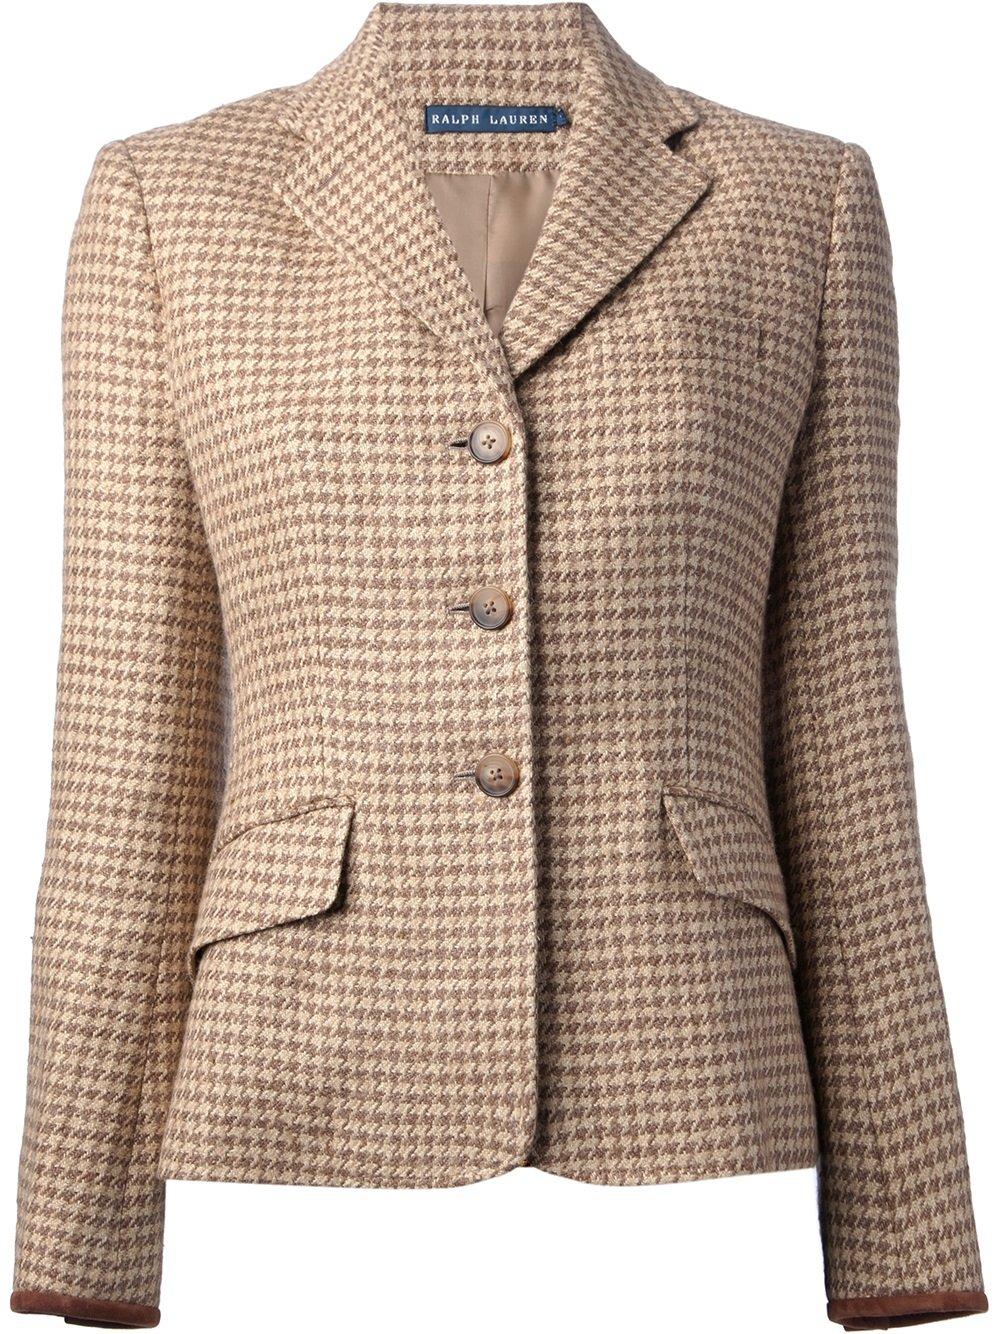 82093977db4 Lyst - Ralph Lauren Blue Label Custom Riding Jacket in Brown